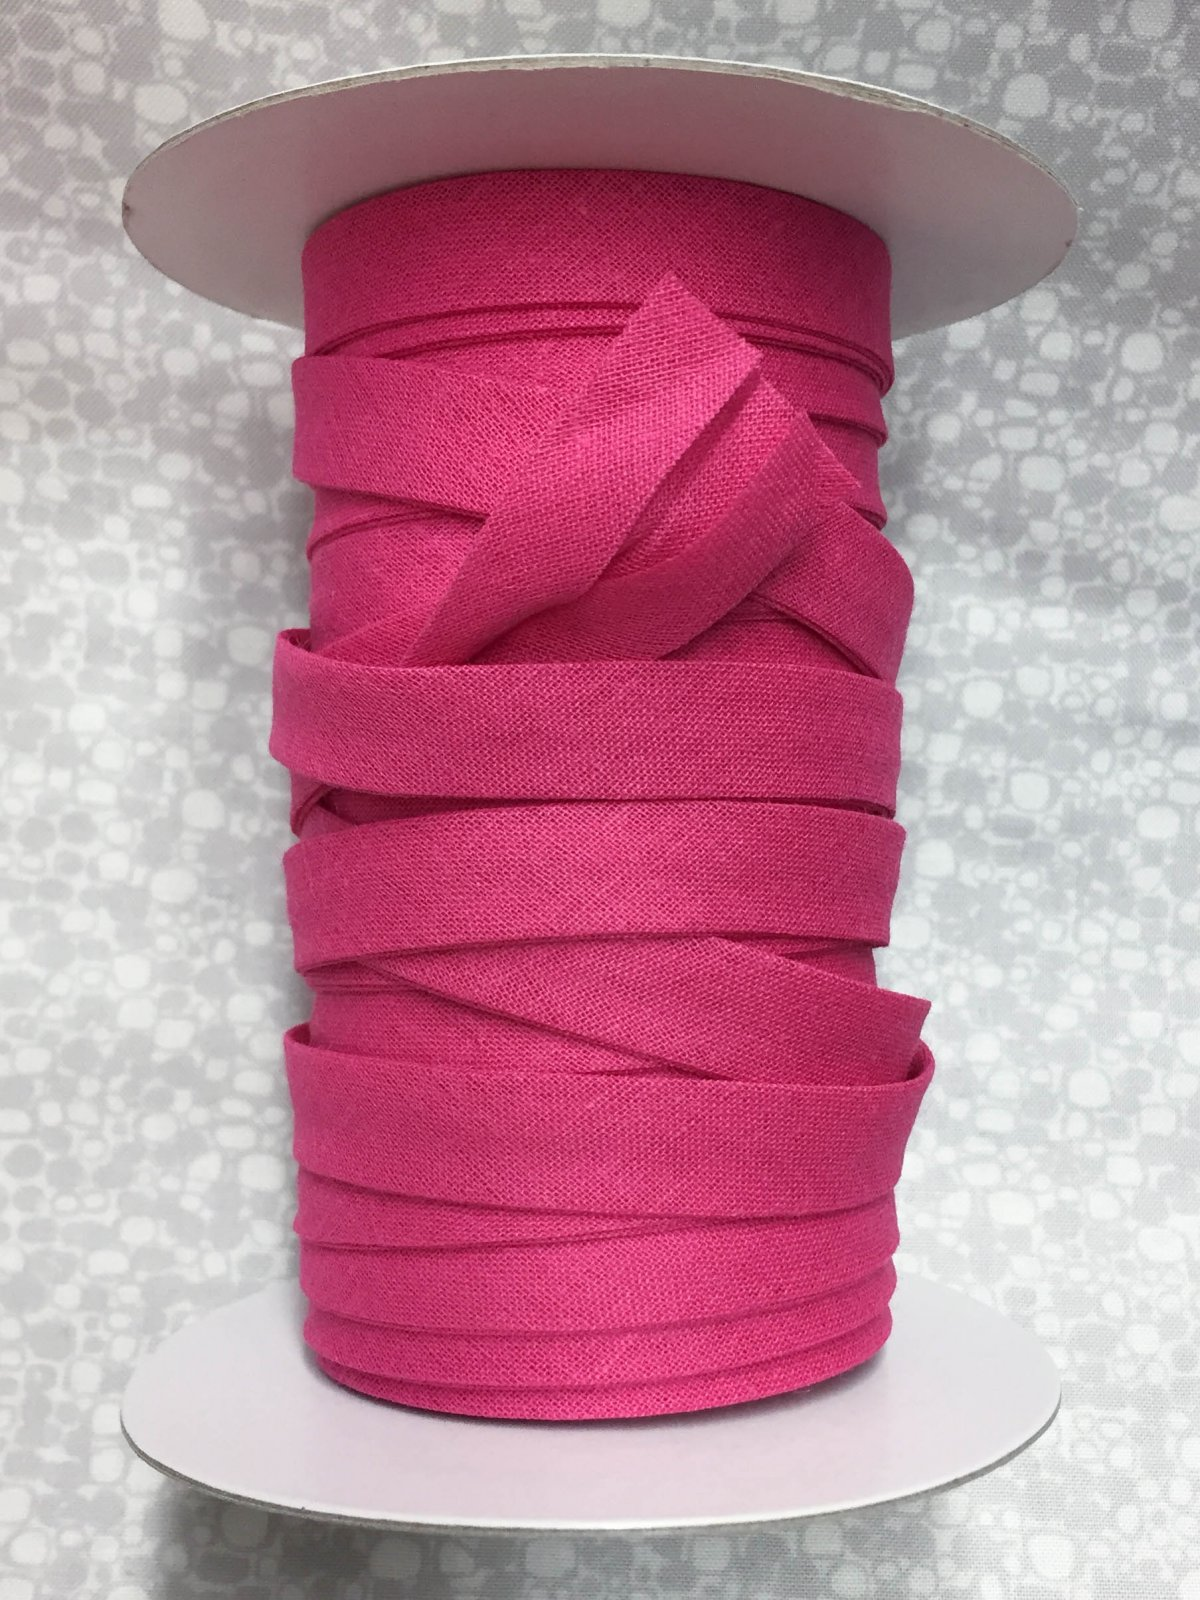 1/2 Finish Double Fold Economy Bias Binding, 10yd - Shocking Pink